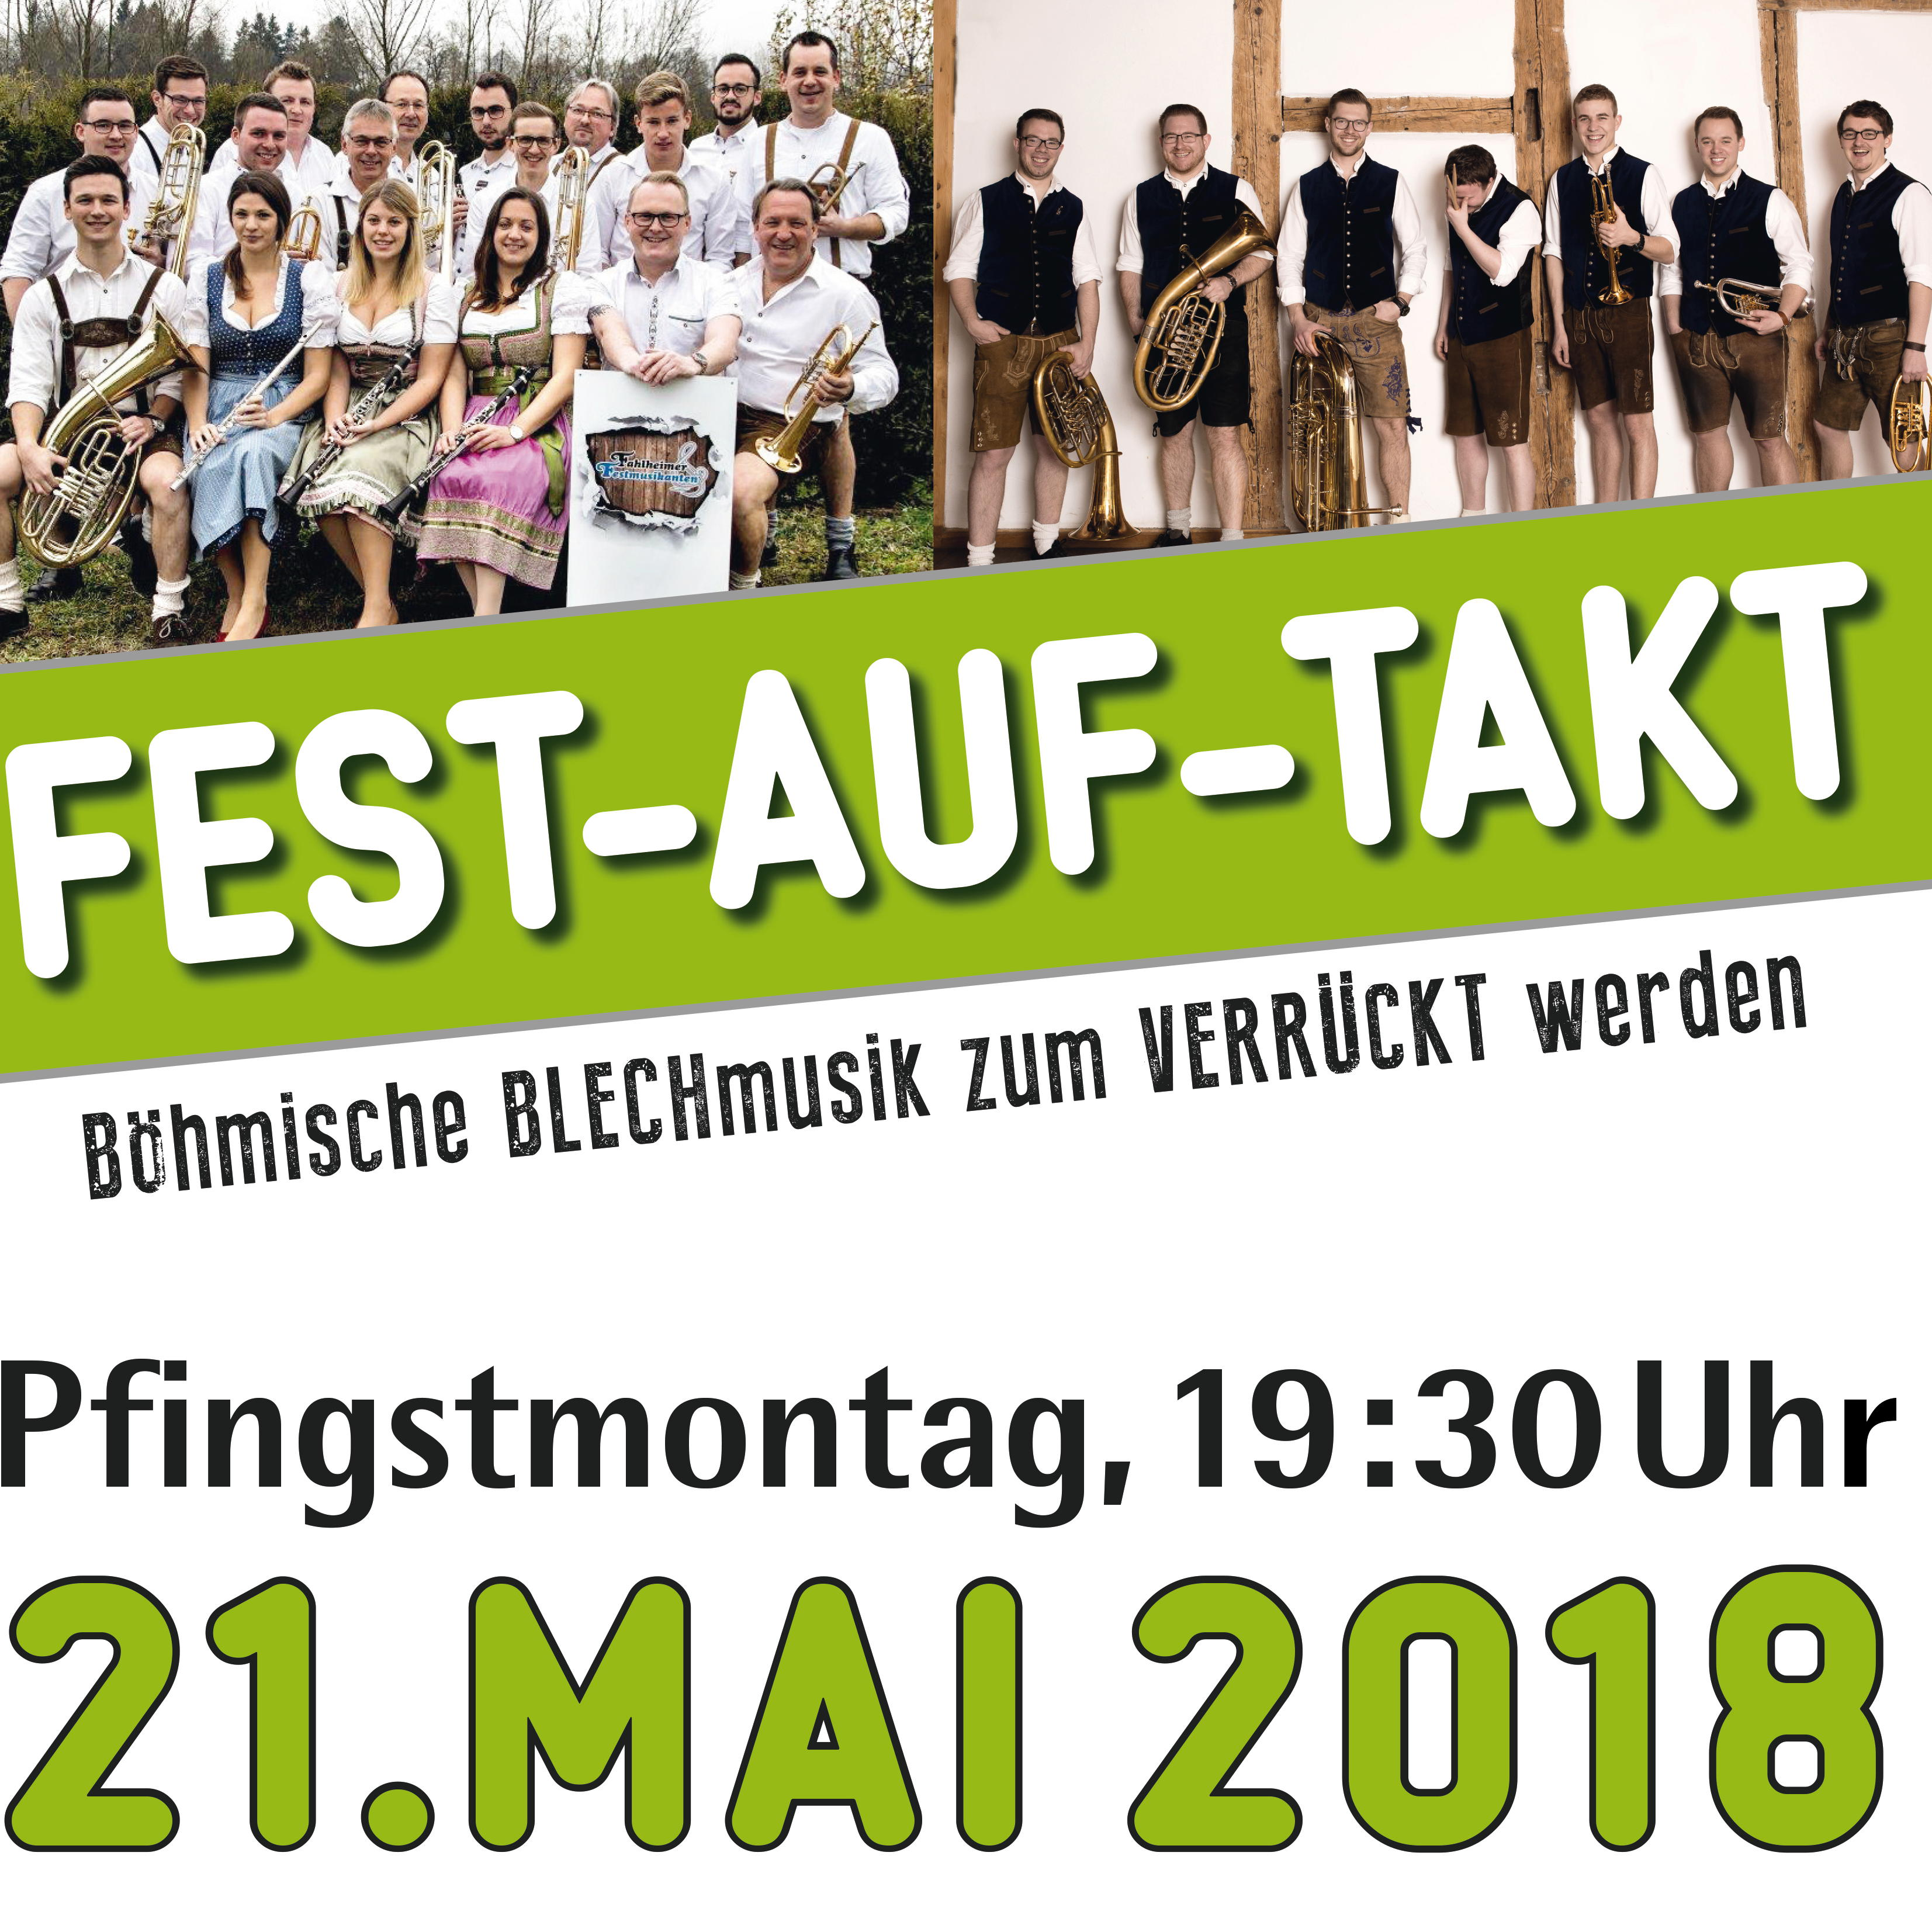 FEST-AUF-TAKT